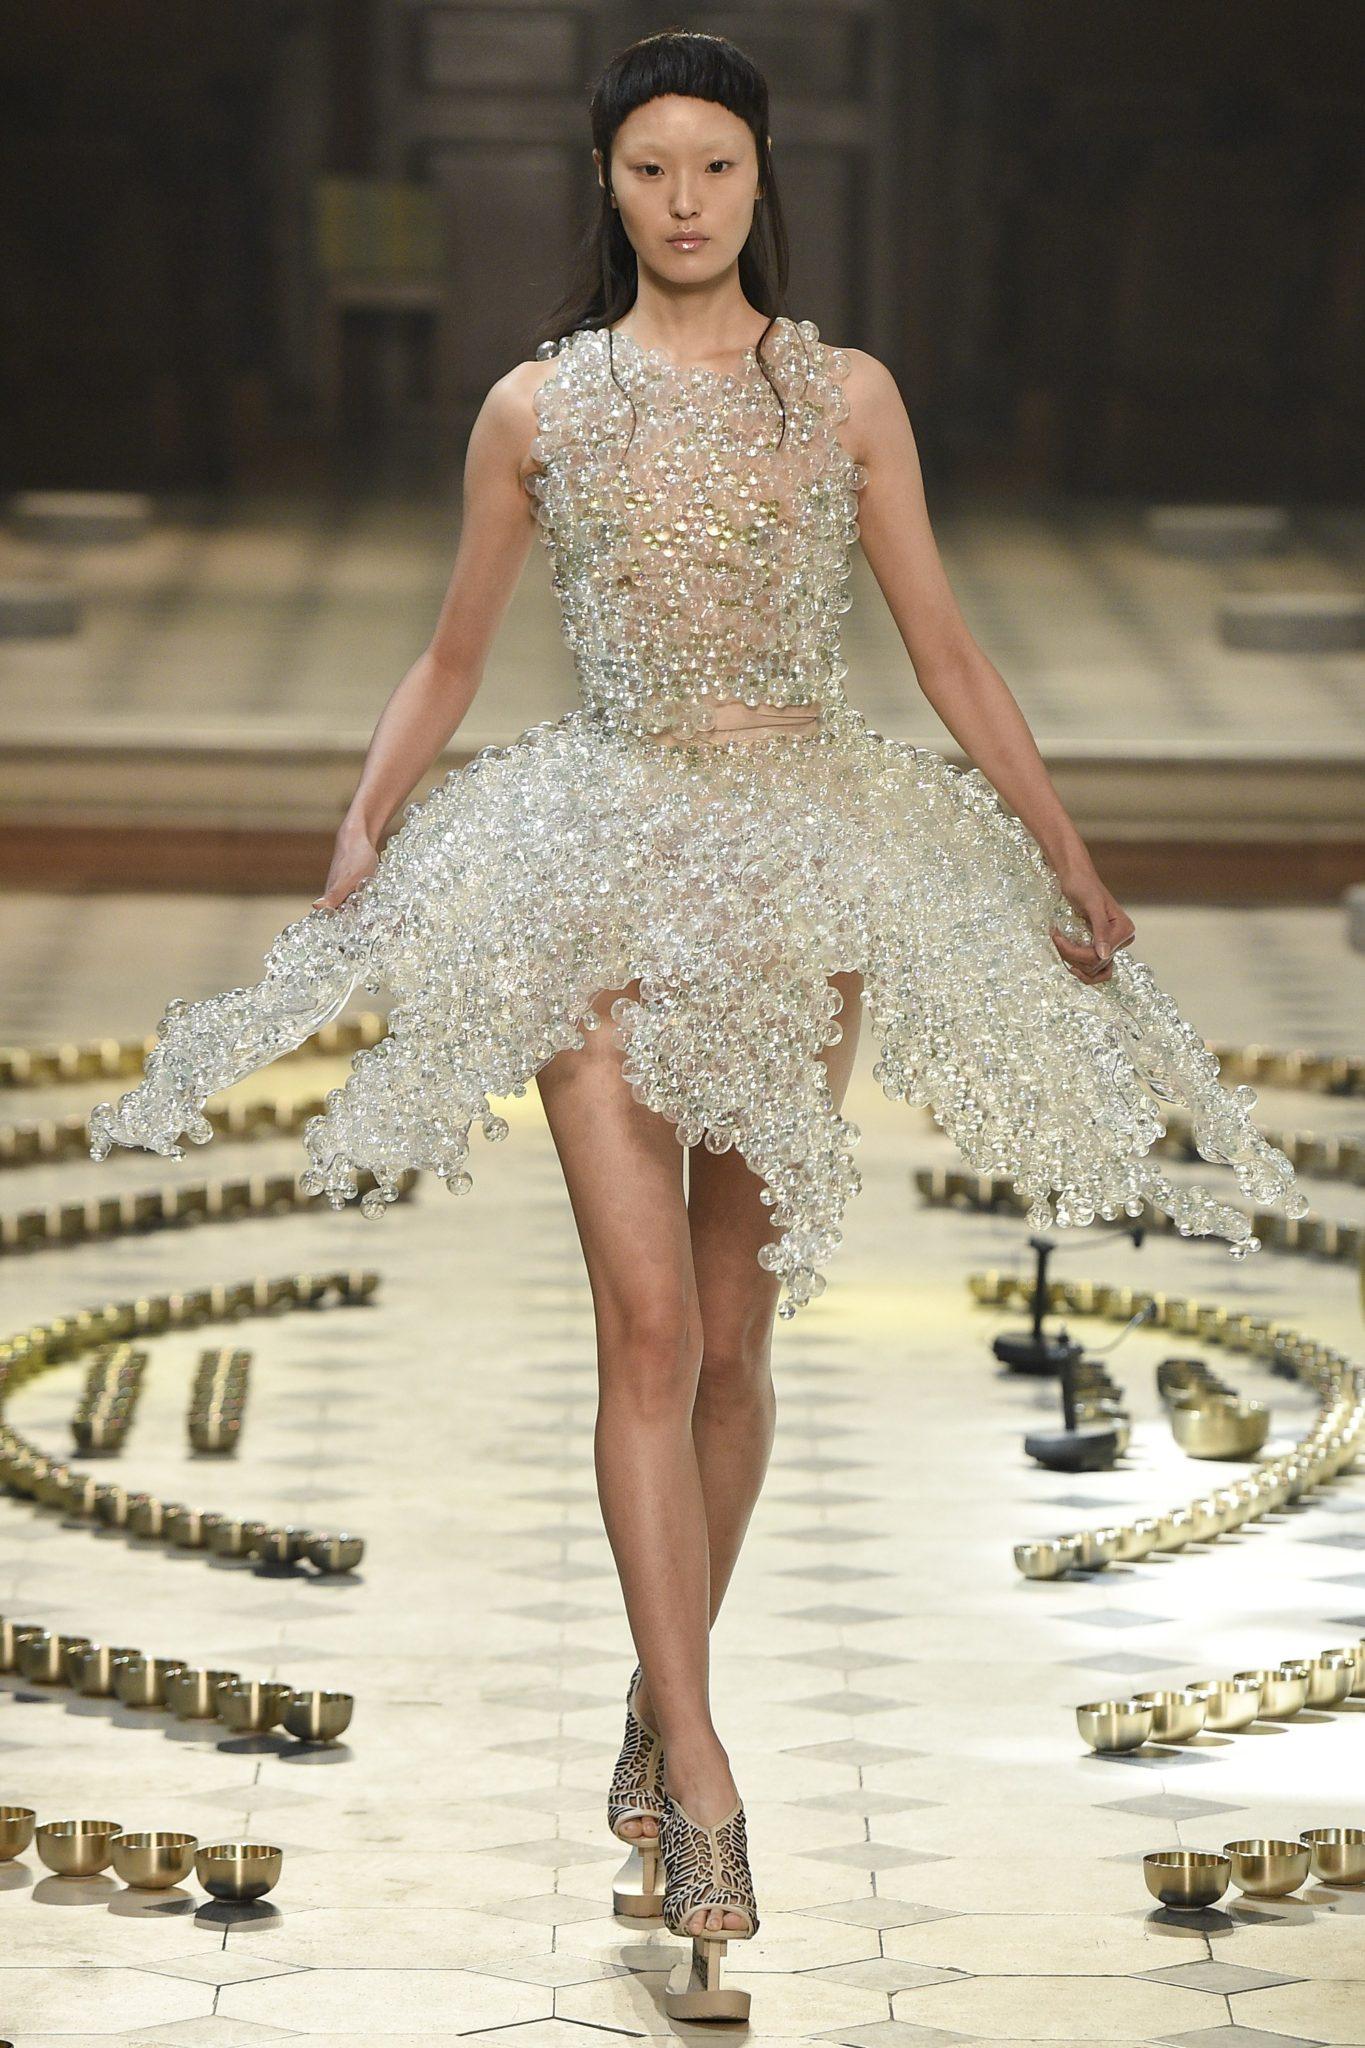 The 'Bubble' Dress | Photo: Kim Weston Arnold / Indigital.tv